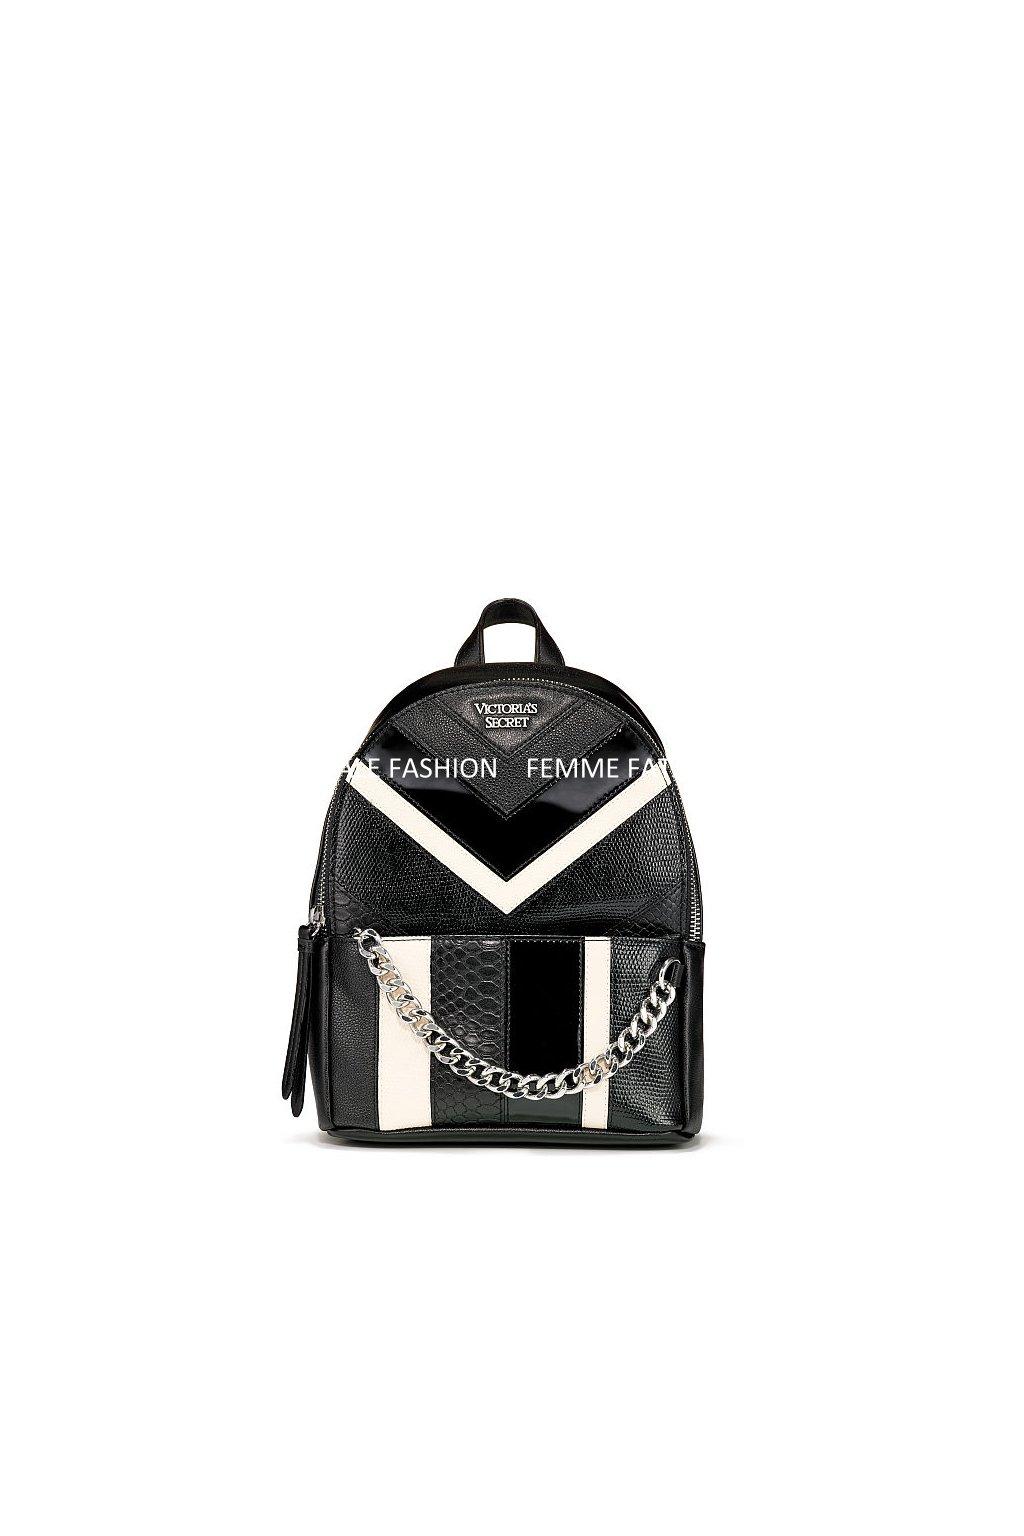 Dámský batoh Victoria's Secret Mixed Chevron Small City Backpack